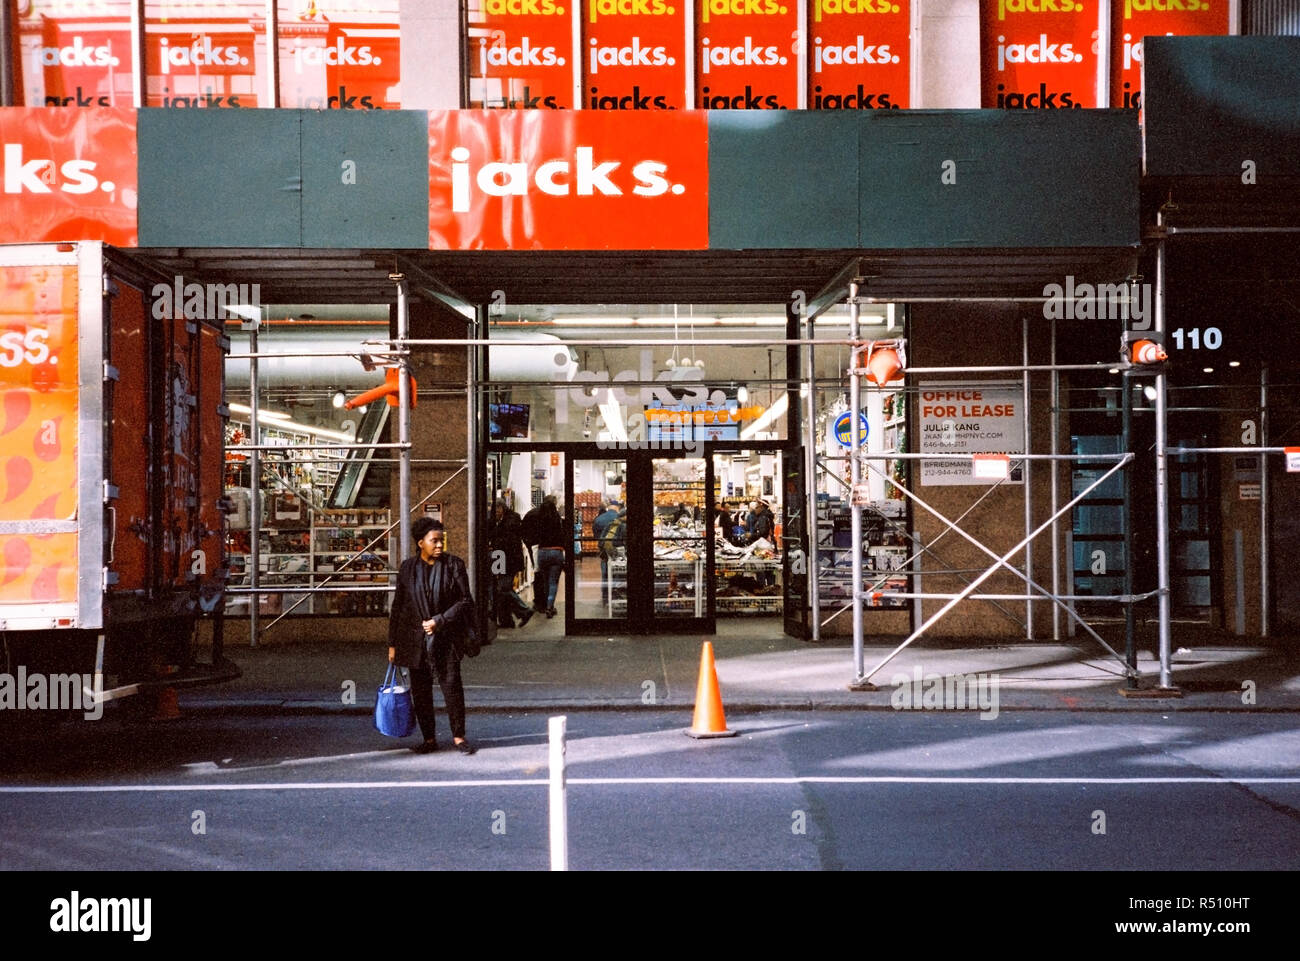 Jacks World 99 Cent Store In Midtown Manhattan 32nd Street New York City